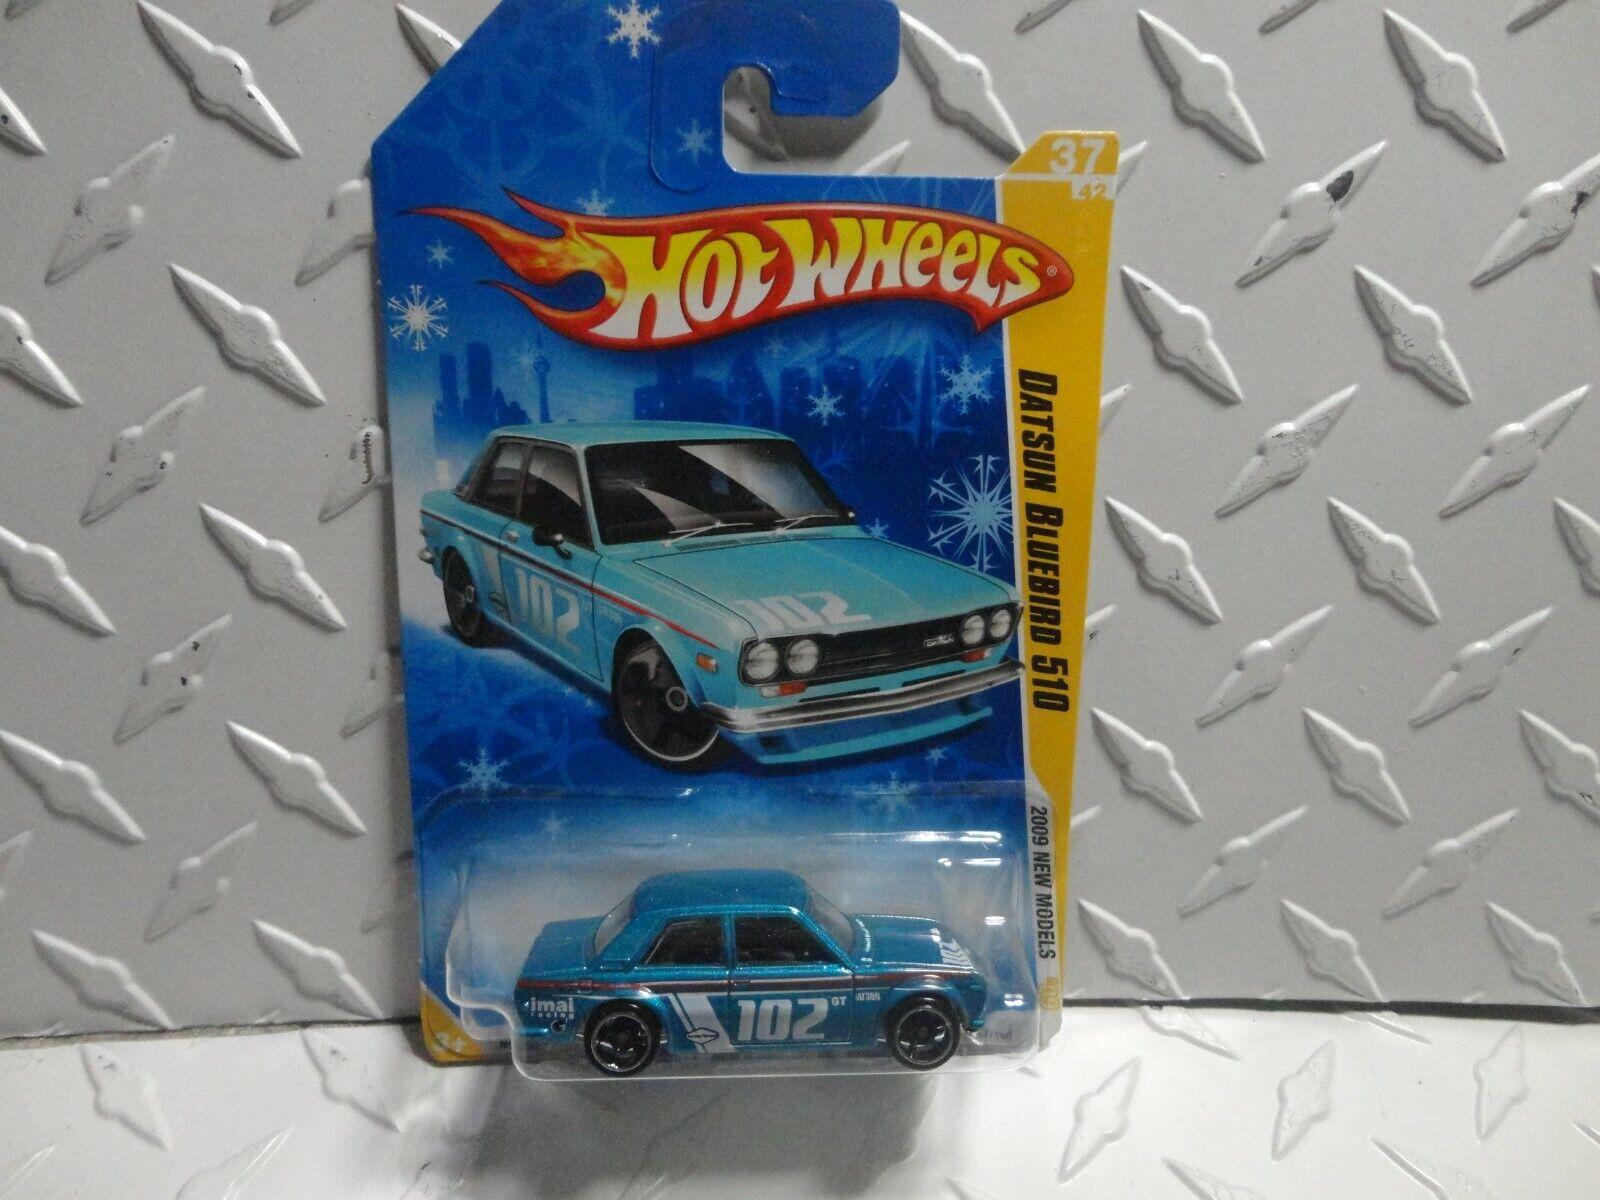 2009 Hot Wheels bluee Datsun blueebird 510 on Snowflake Card in Predecto